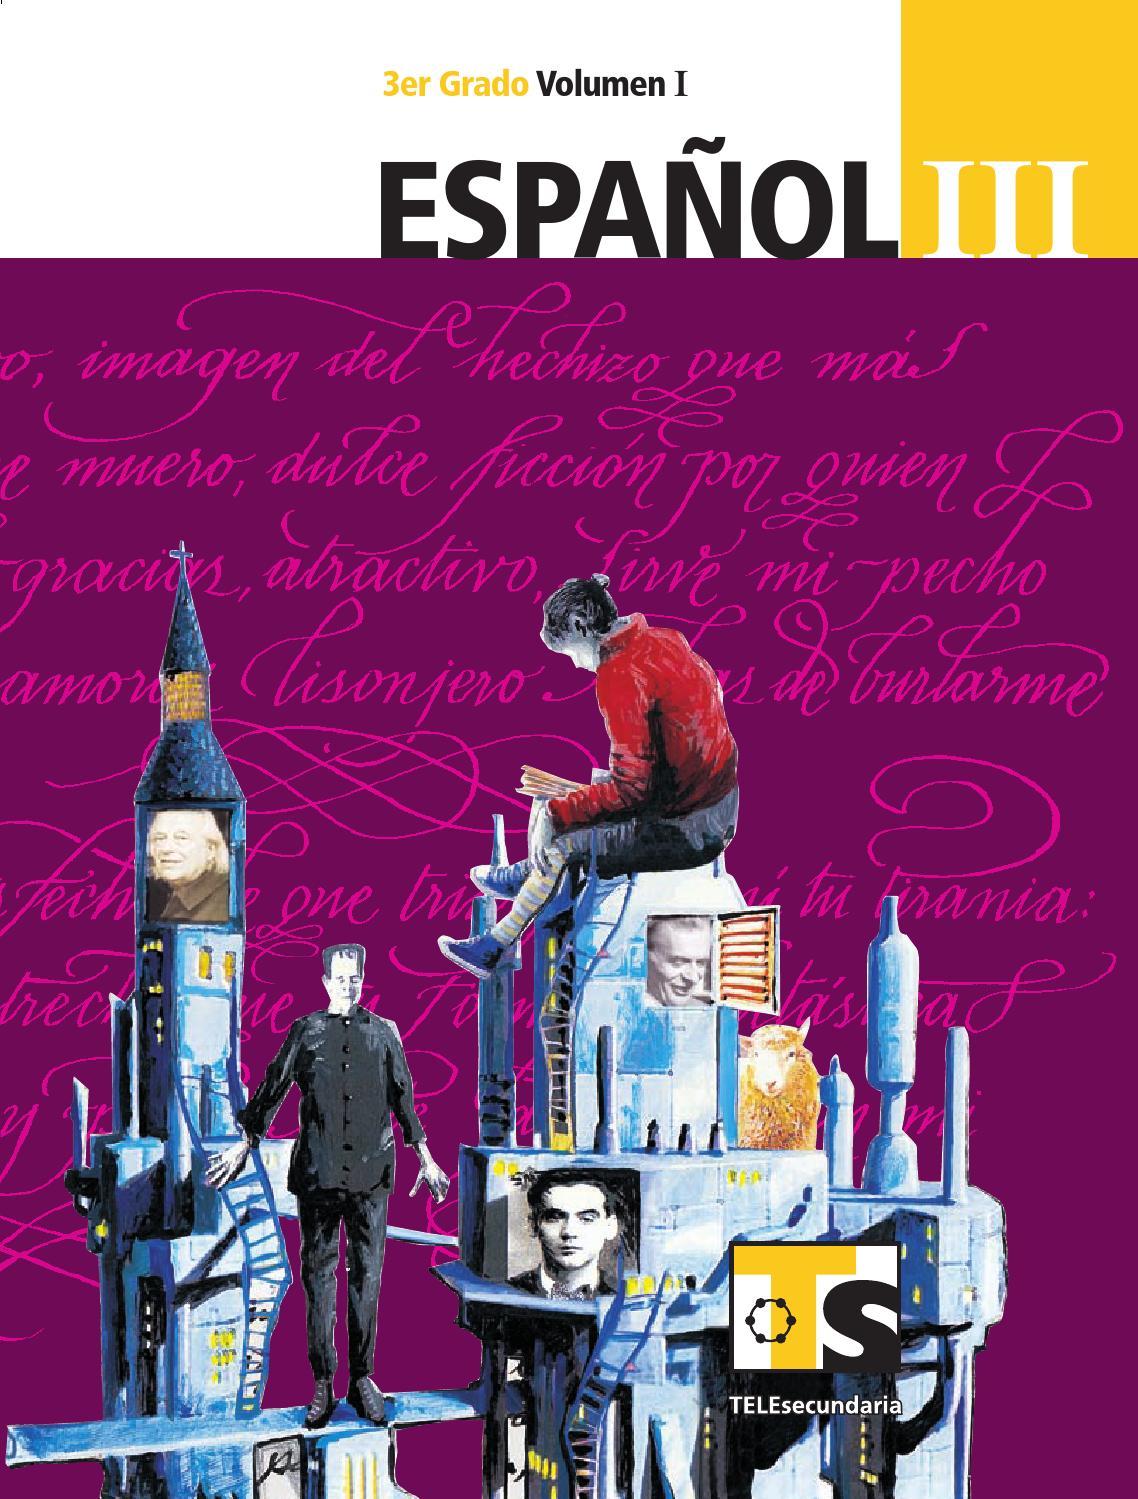 Español 3er. Grado Volumen I by Rarámuri - issuu